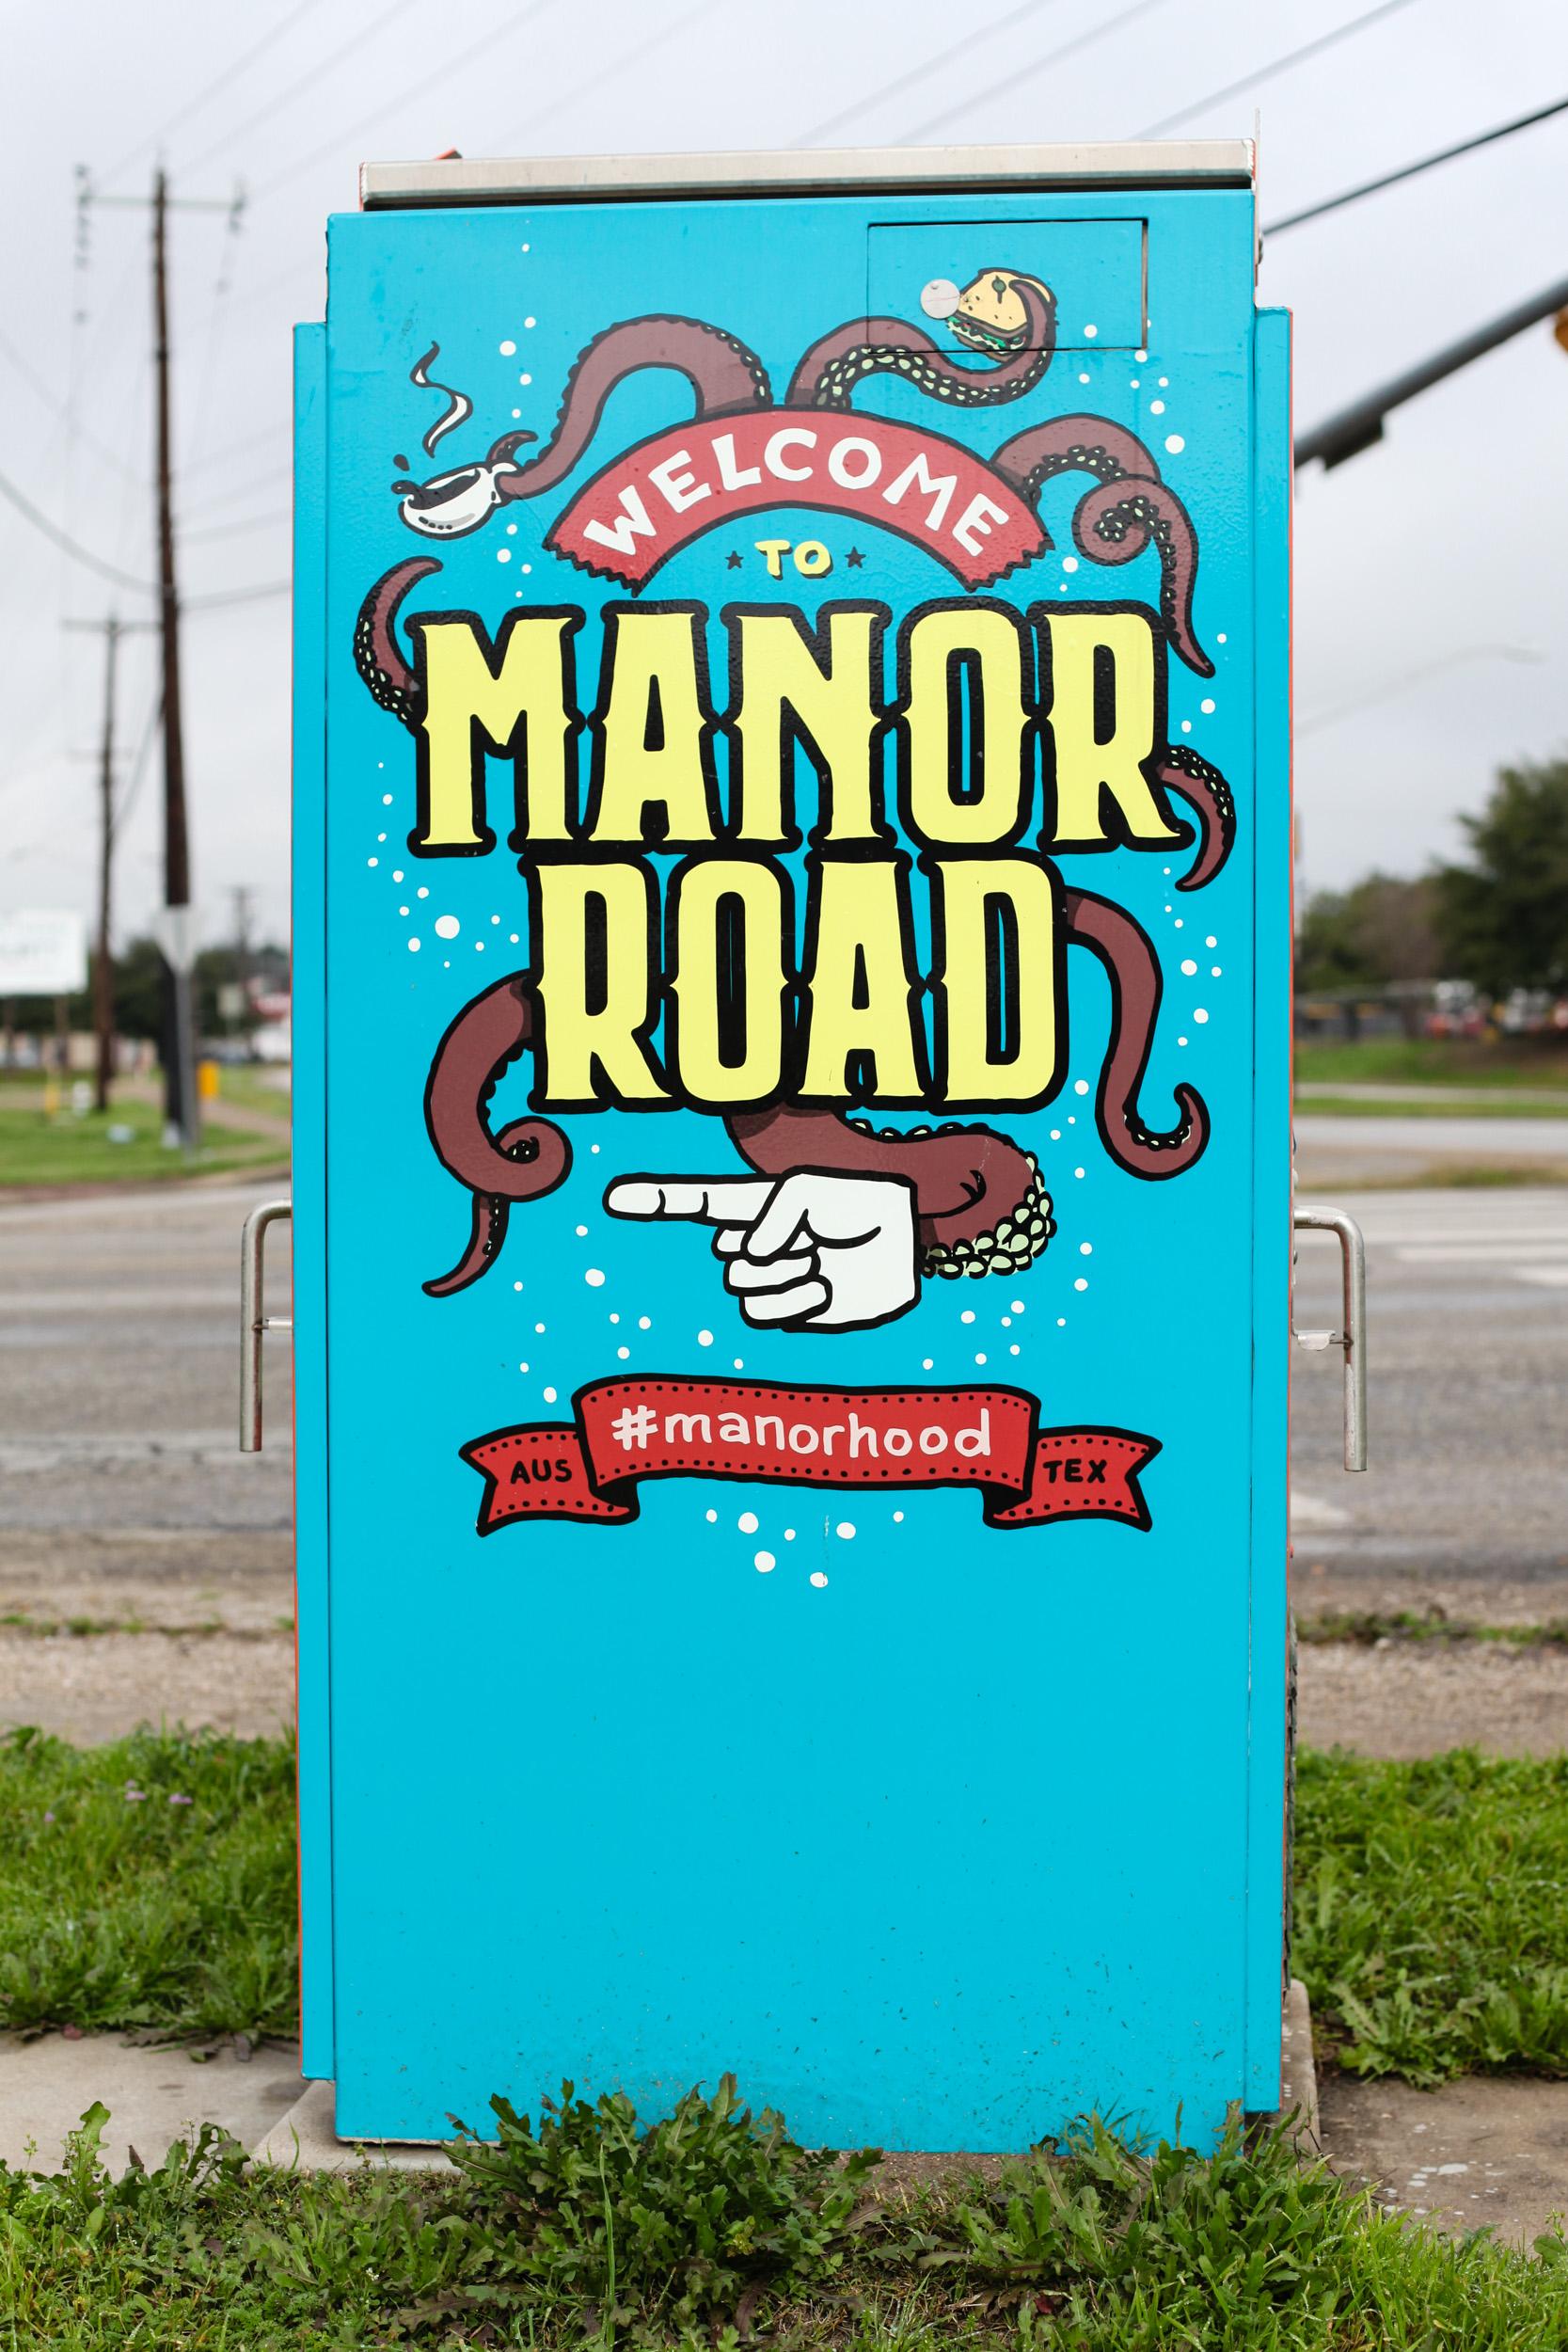 Manor Rd-19edw.jpg